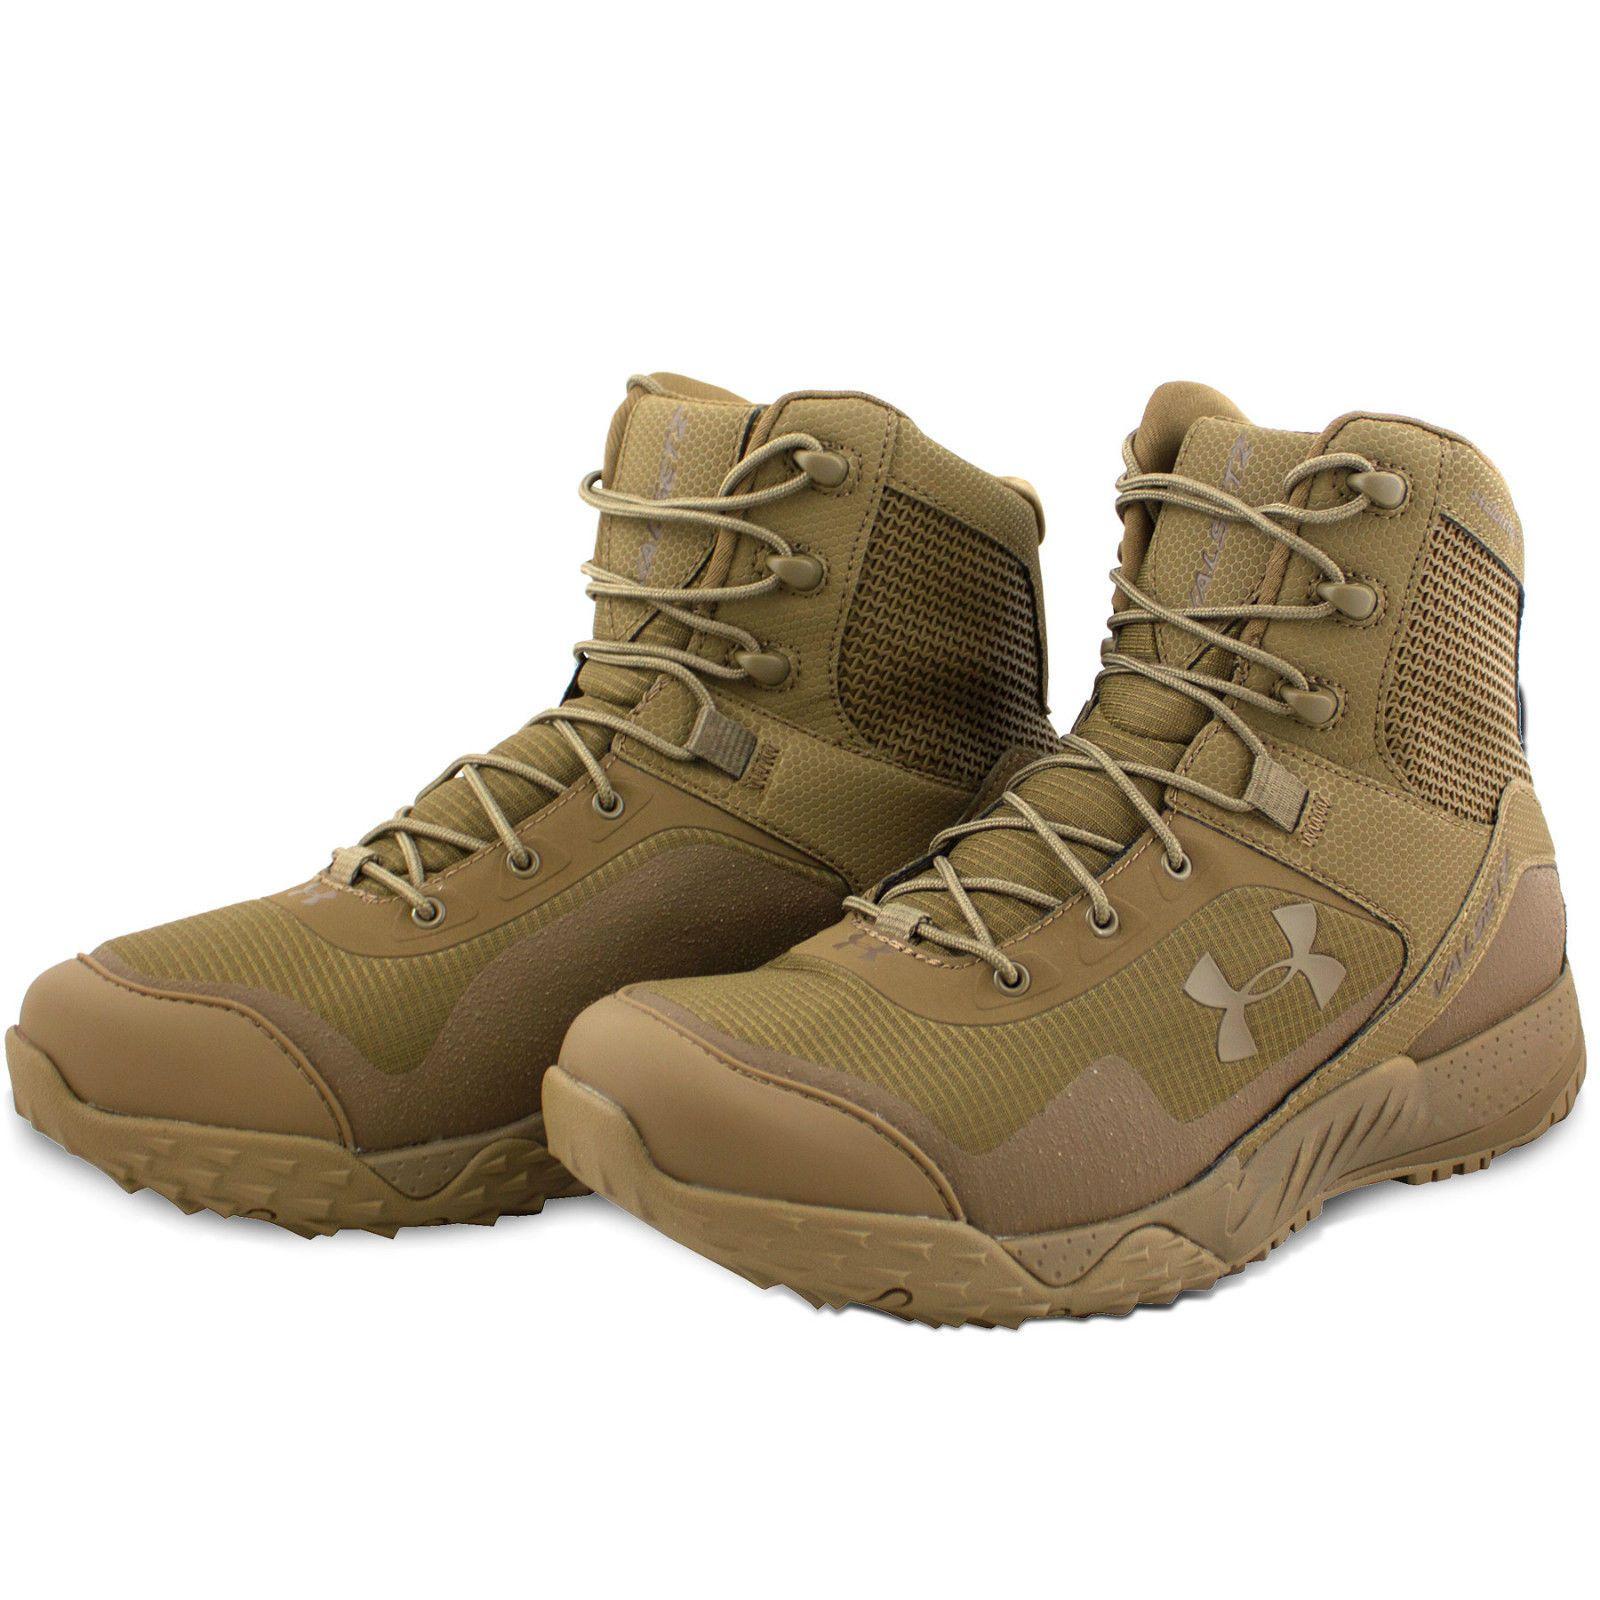 fac7f3f11de Details about Under Armour Tactical Valsetz RTS Boots Military ...